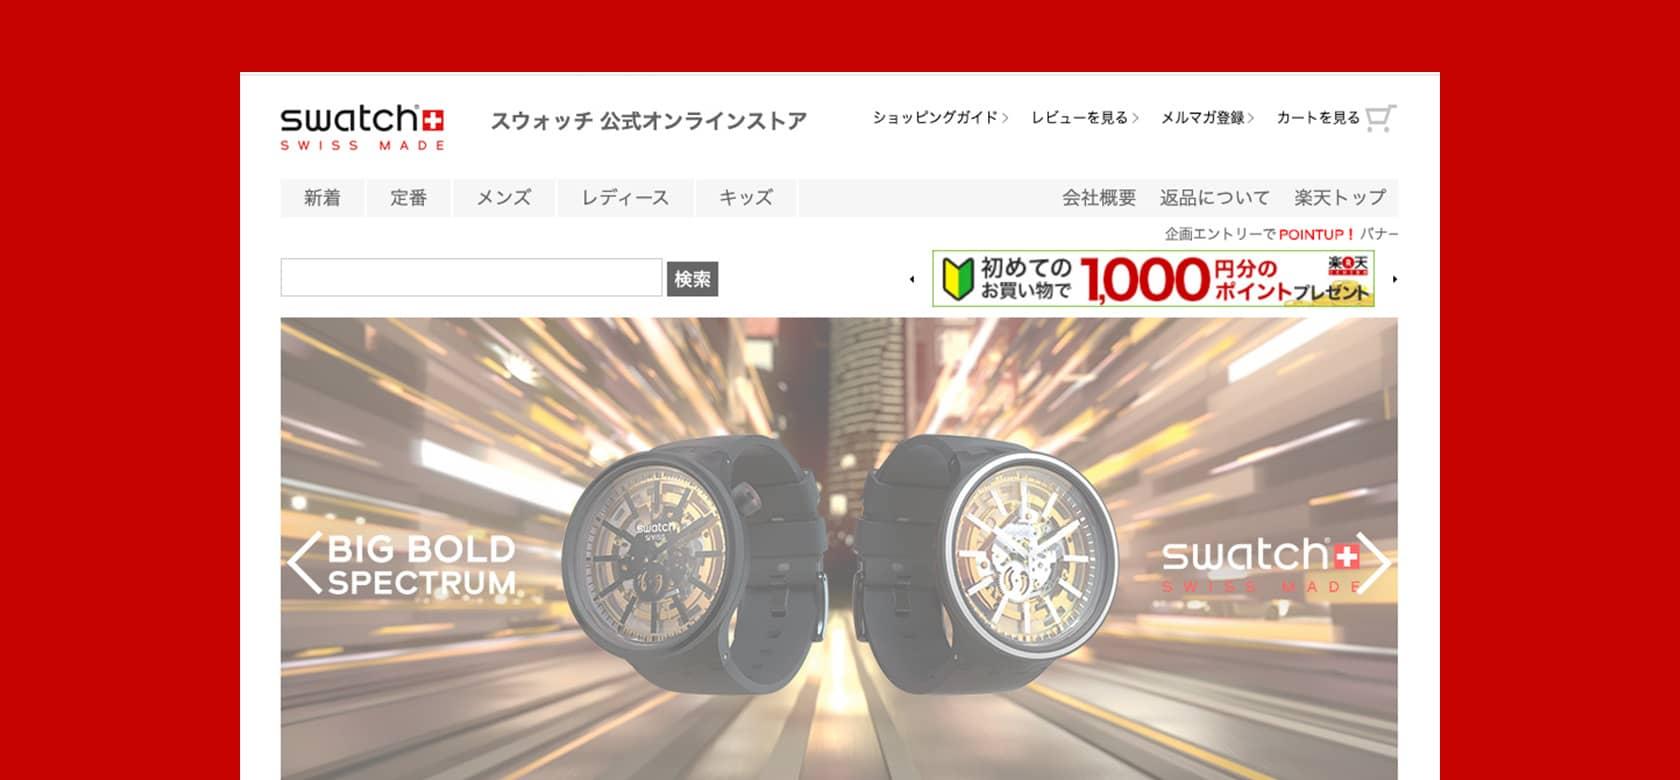 Swatch Japan